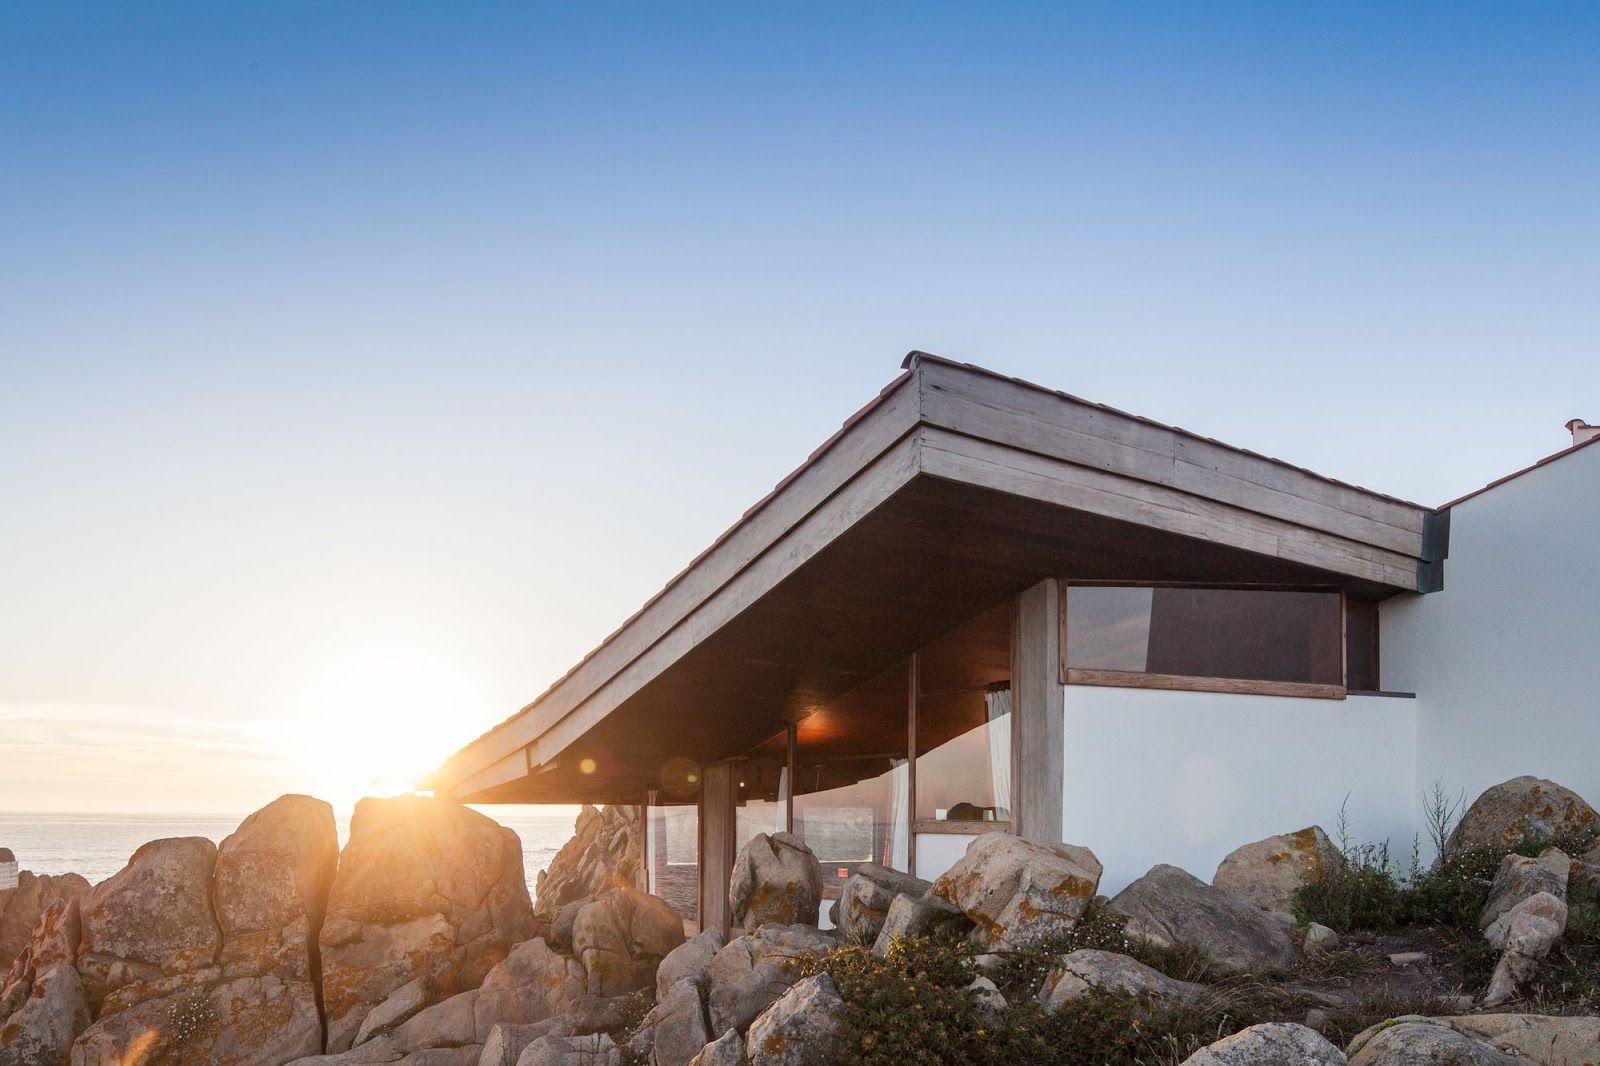 alvaro siza portugal architecte portugais r%C3%A9alisation salon de the restaurant boa nova - Álvaro Siza et le régionalisme critique